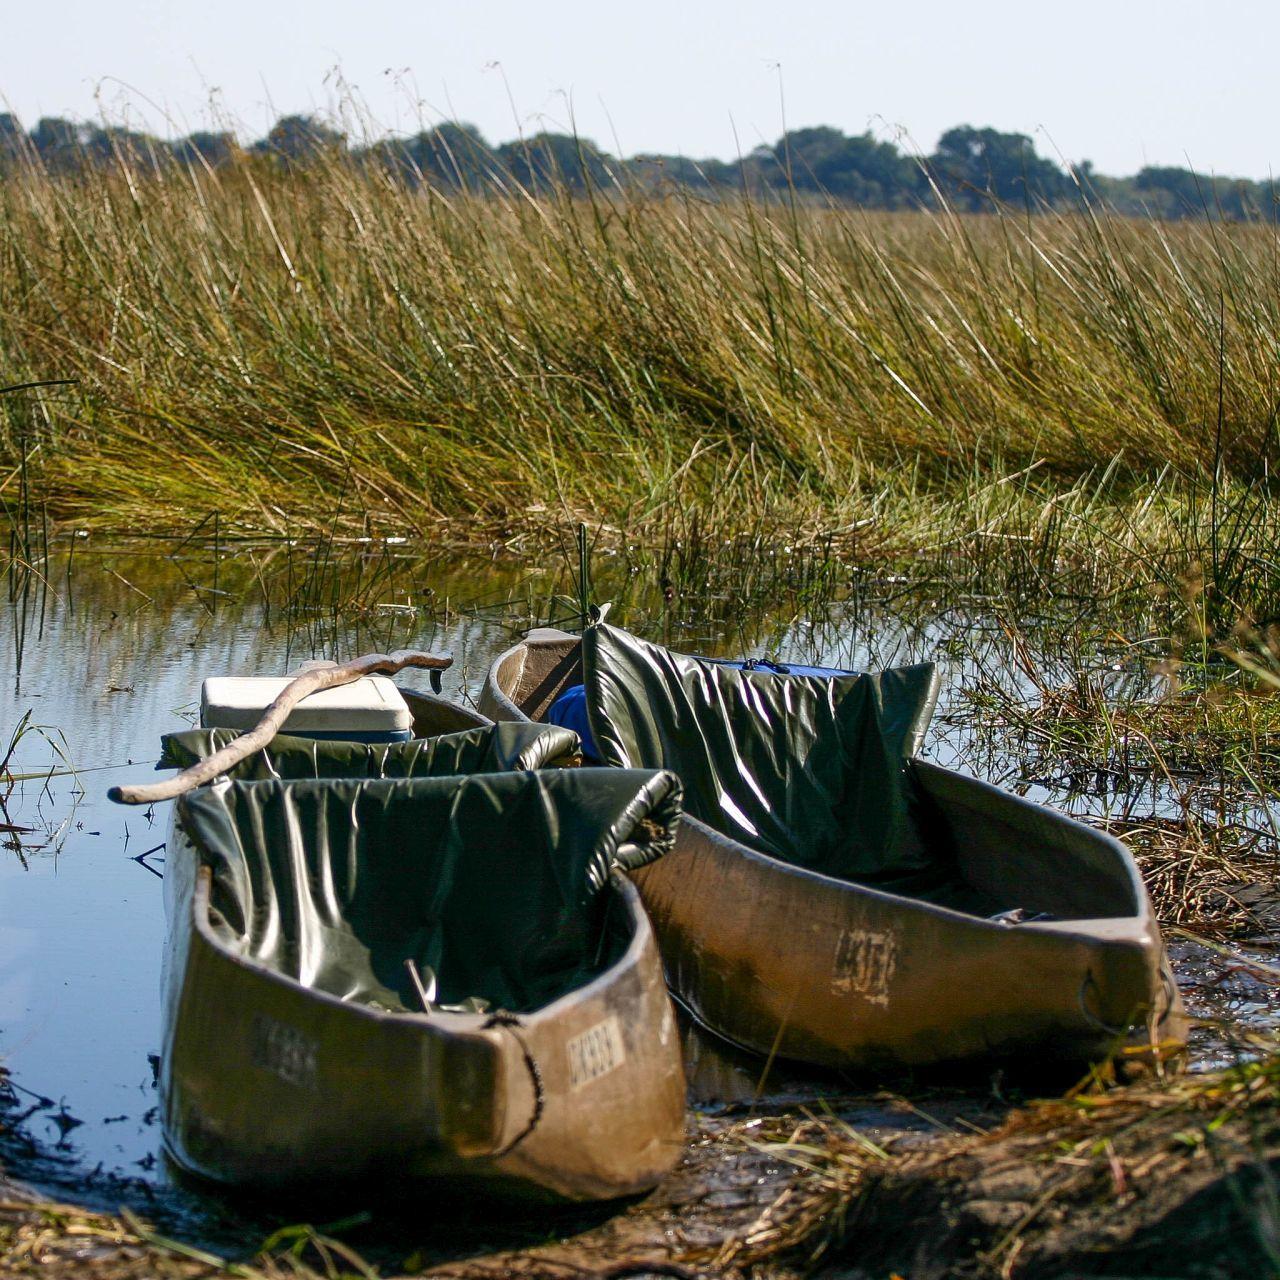 Okavango Delta - A World Heritage Site